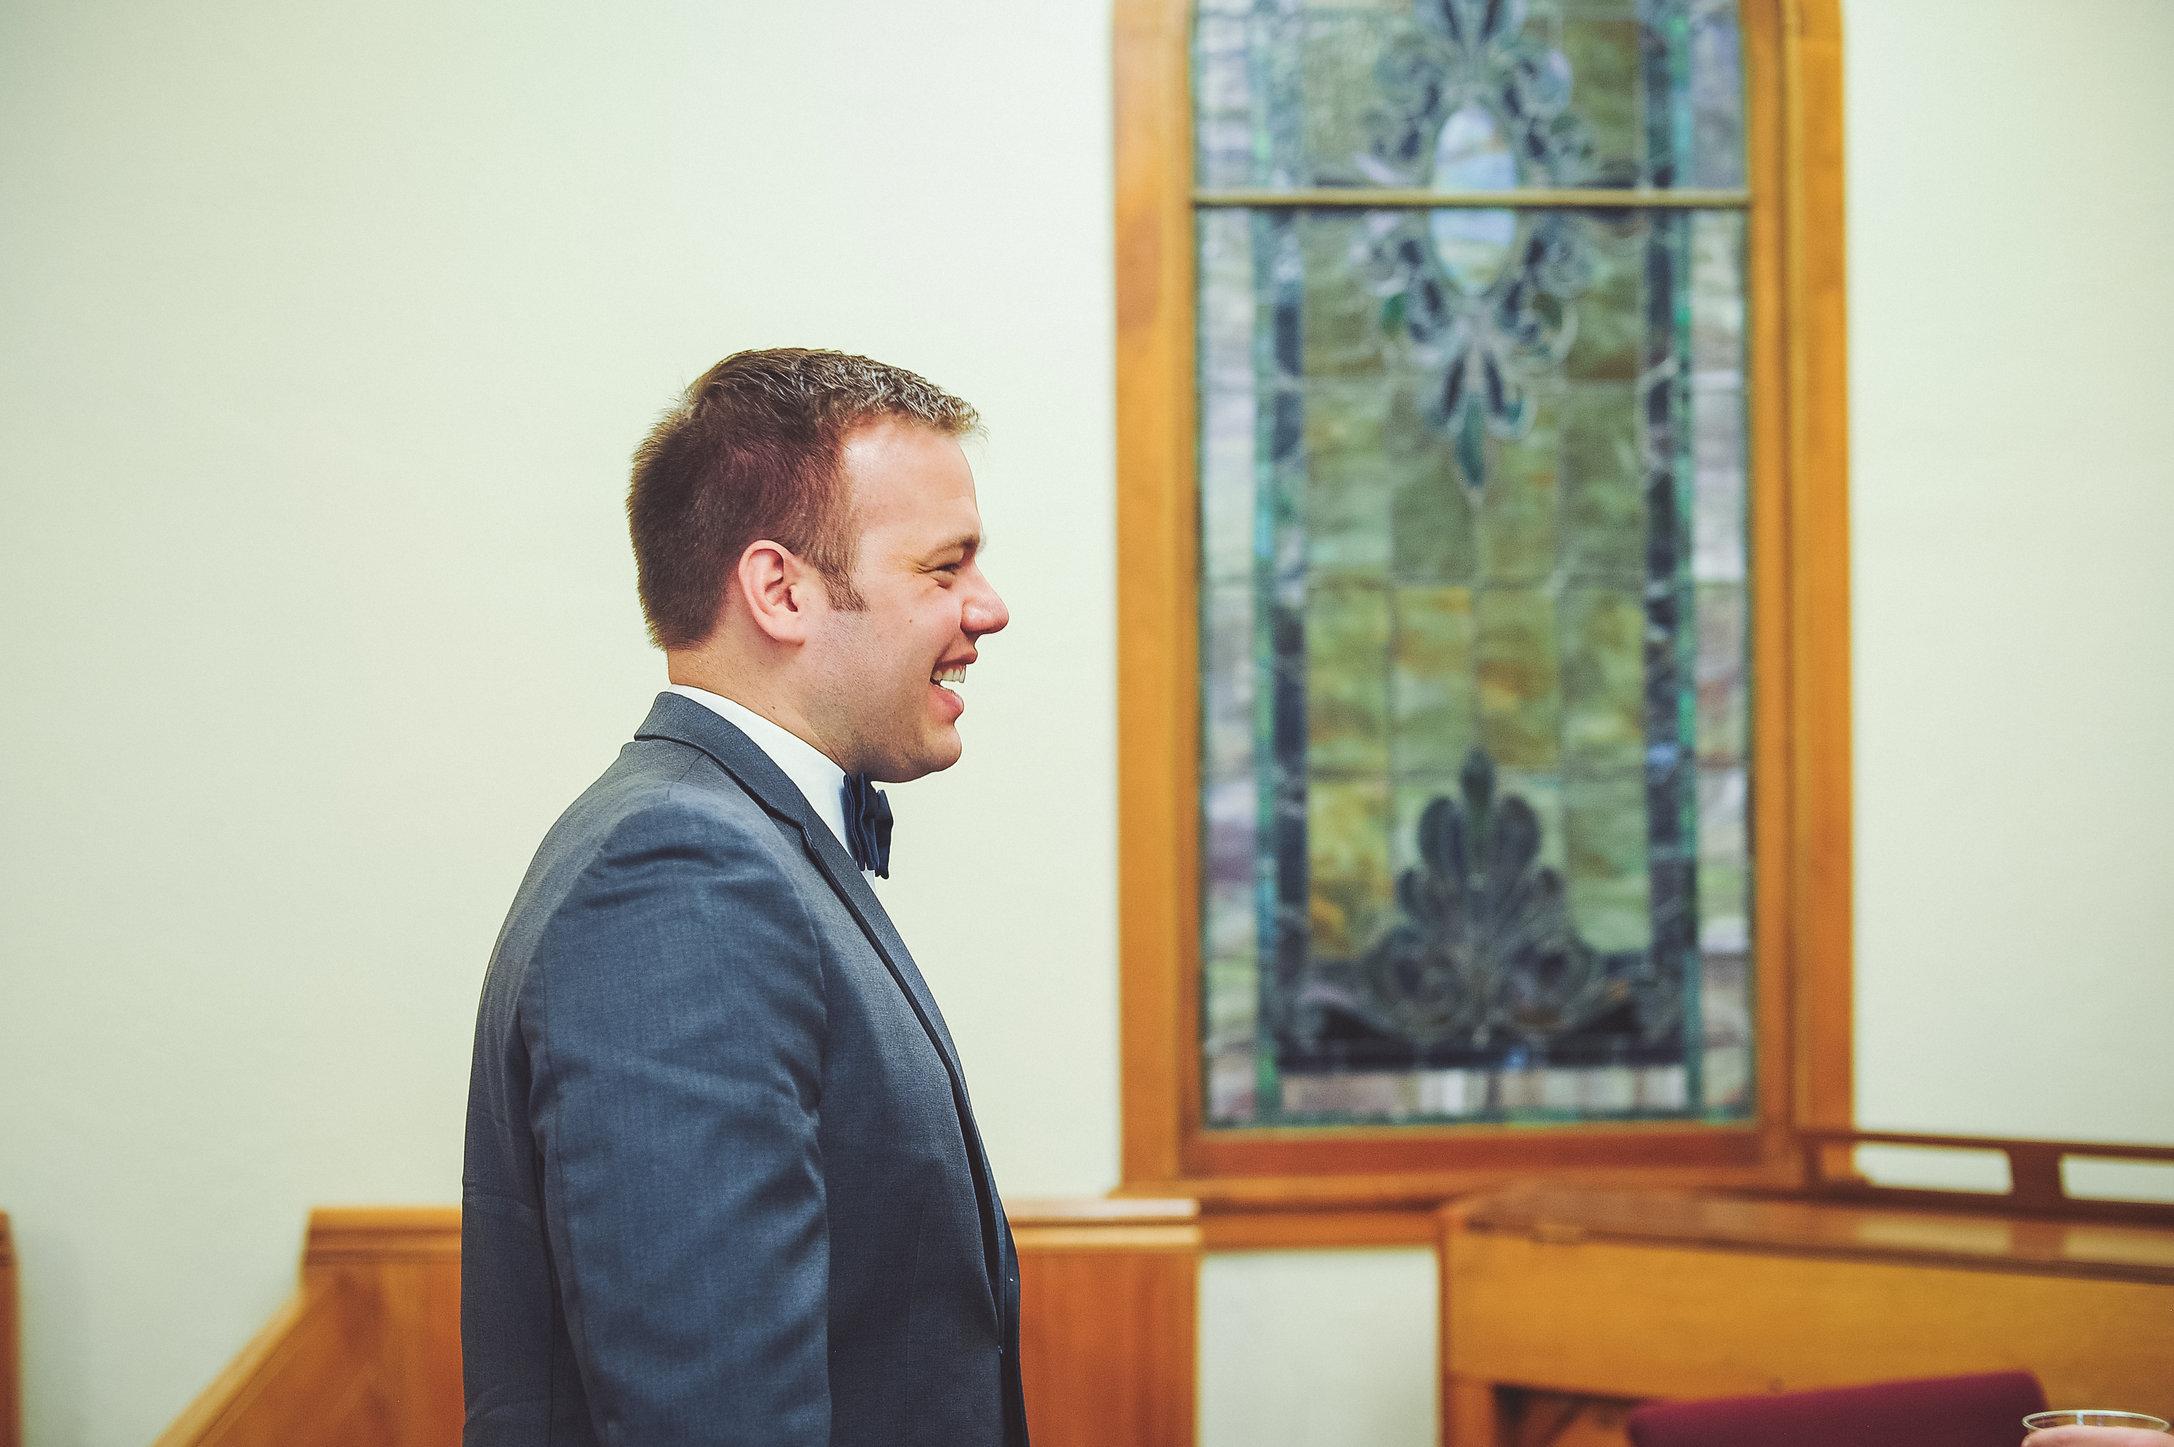 SandC-wedding-80.jpg